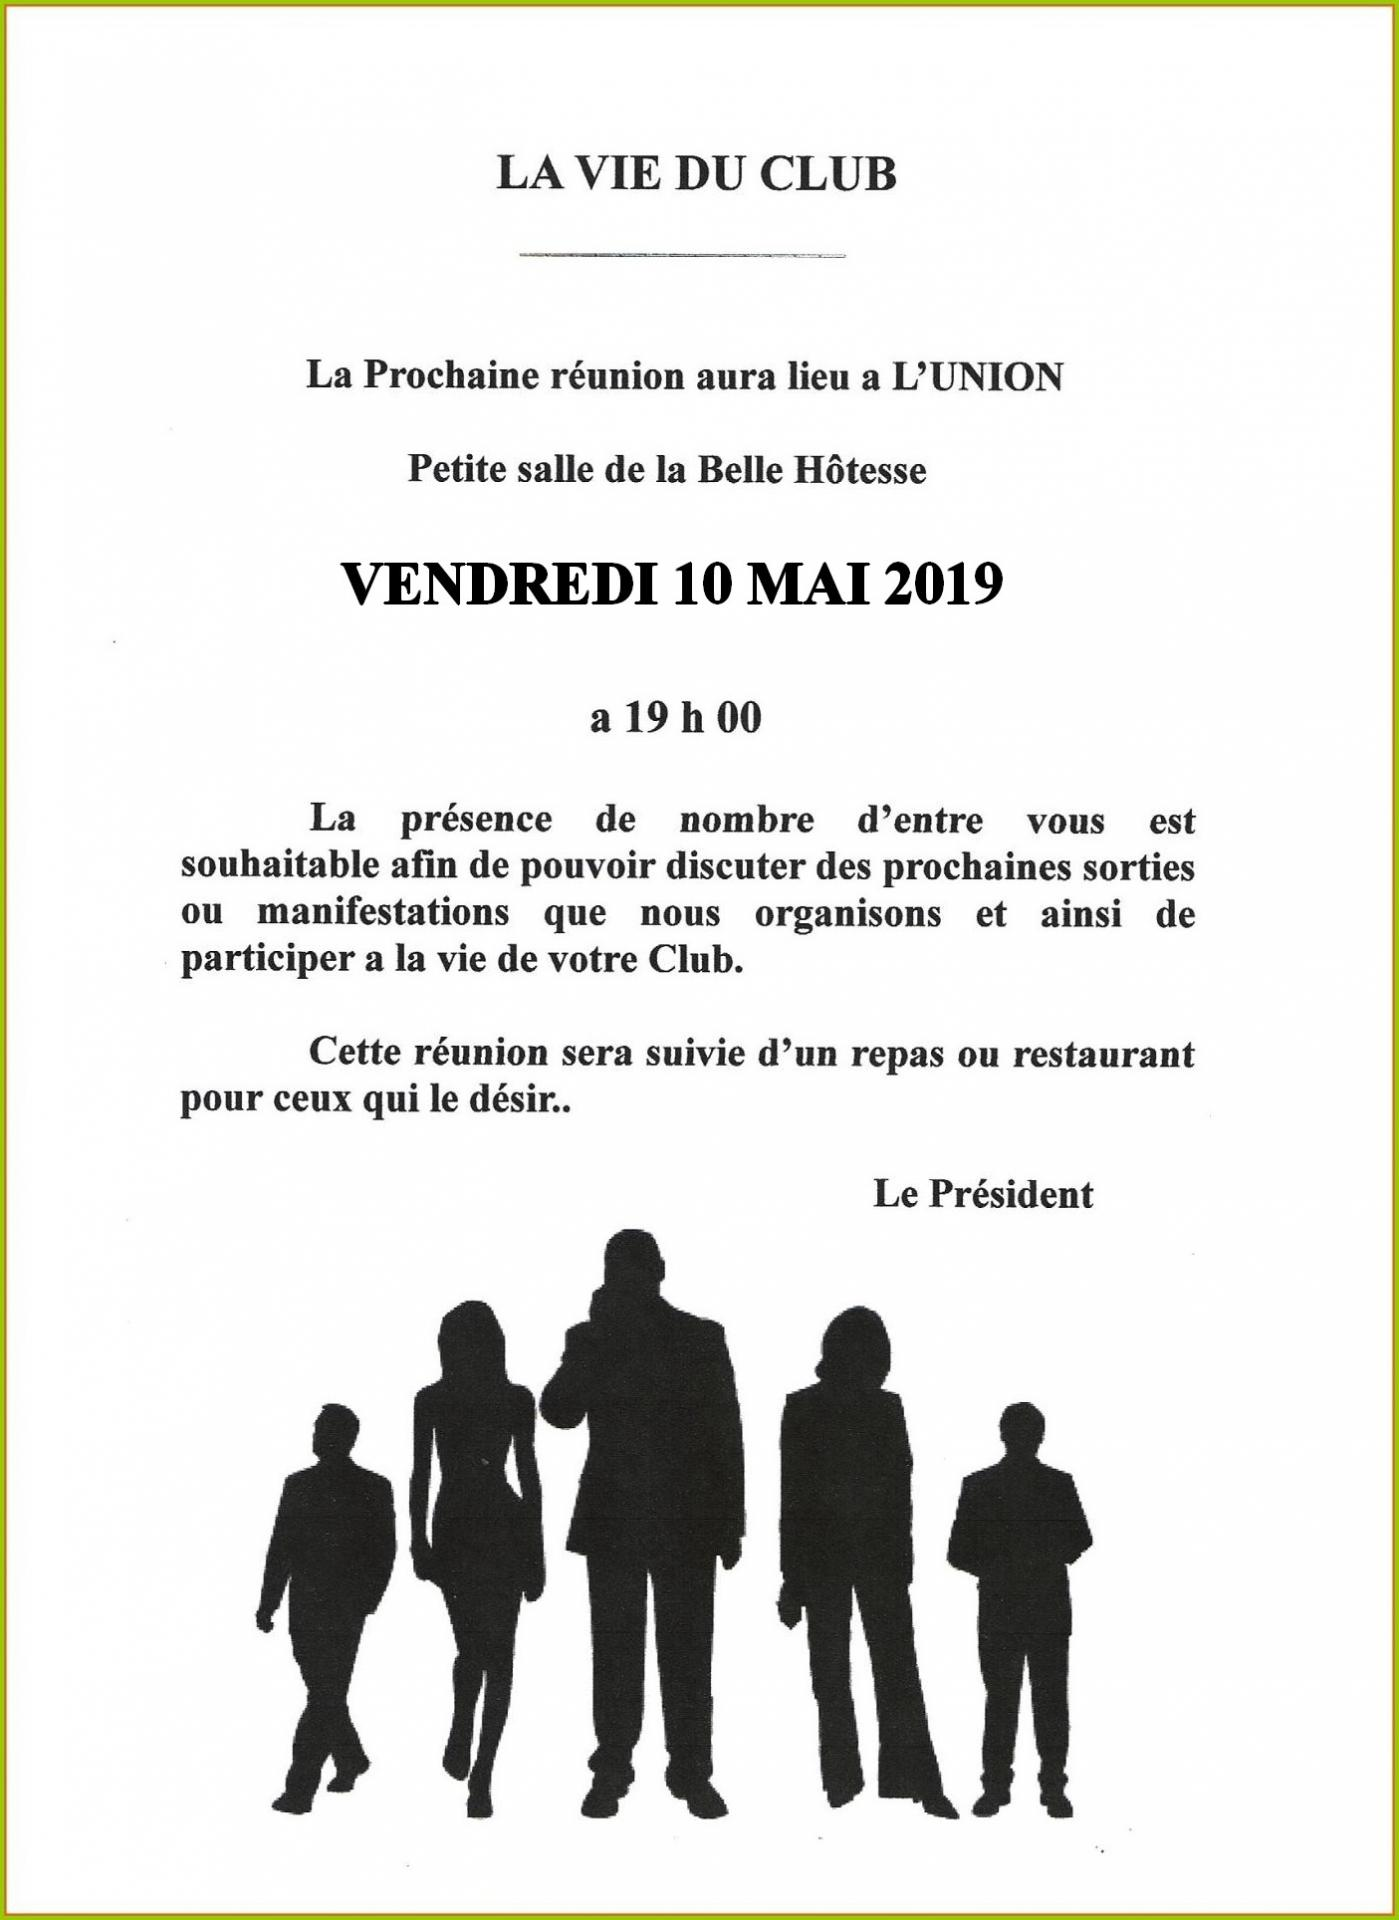 Reunion belle hotesse 05 2019